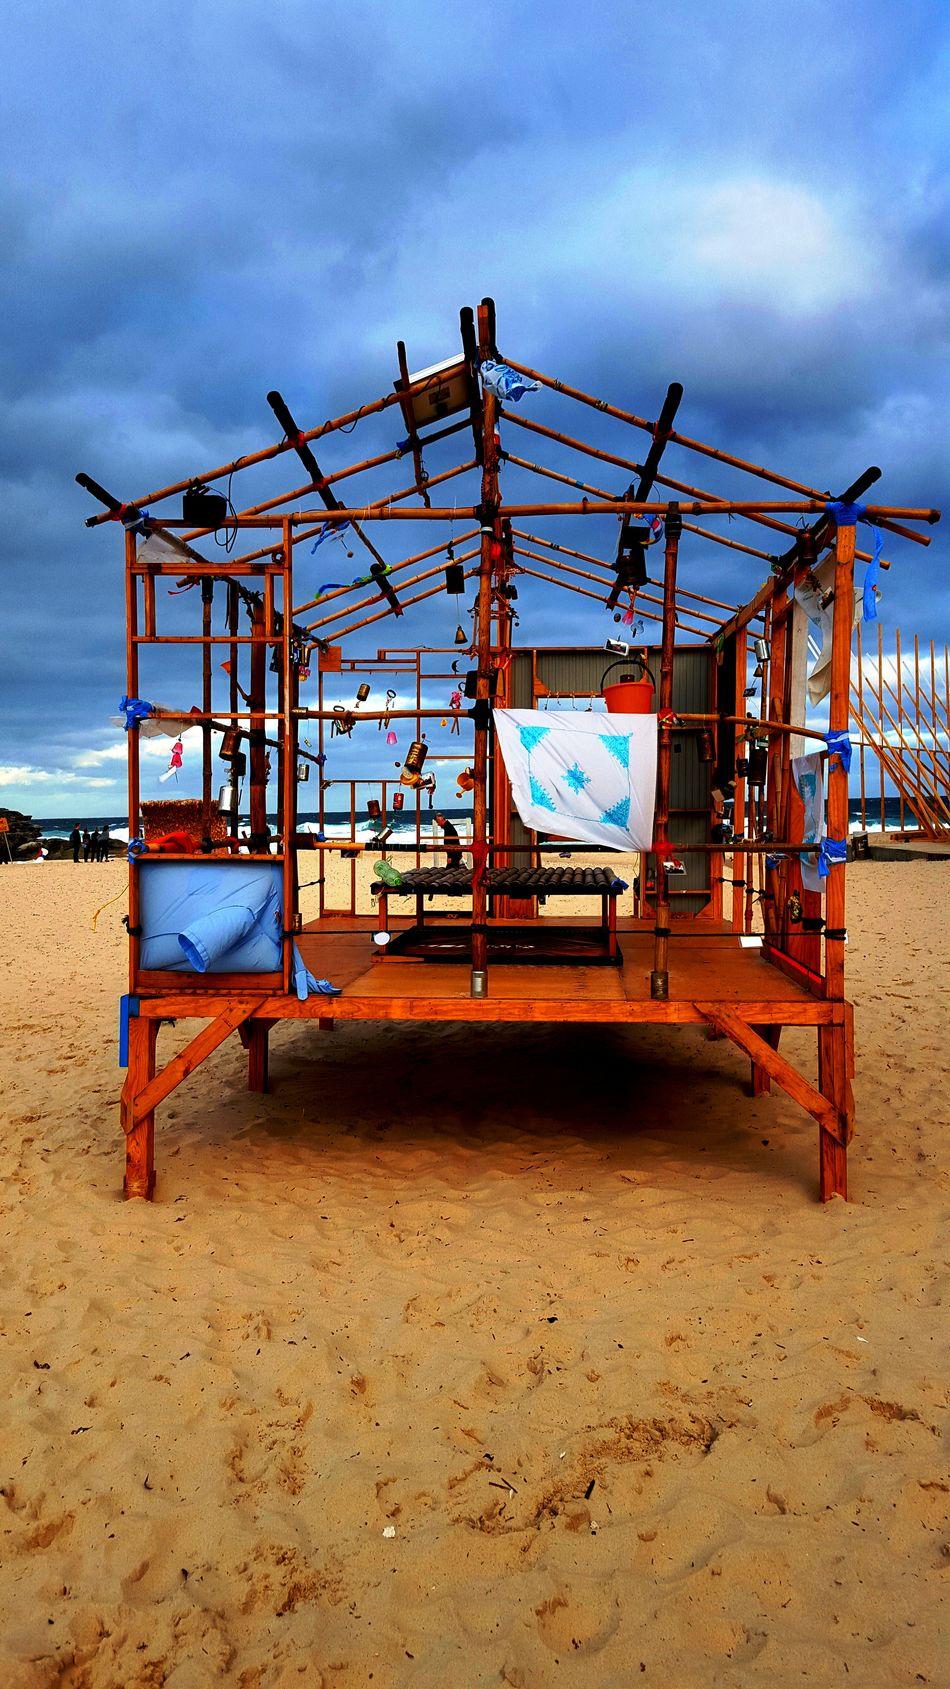 BeacH SCulpTures Art Work Beach Beach Life Bondi Beach Cloth Creativity Day Evening Hanging Nature Outdoors Sand Sculptures Sea Sky Sky And Clouds Sydney Windy Wooden Workmanship